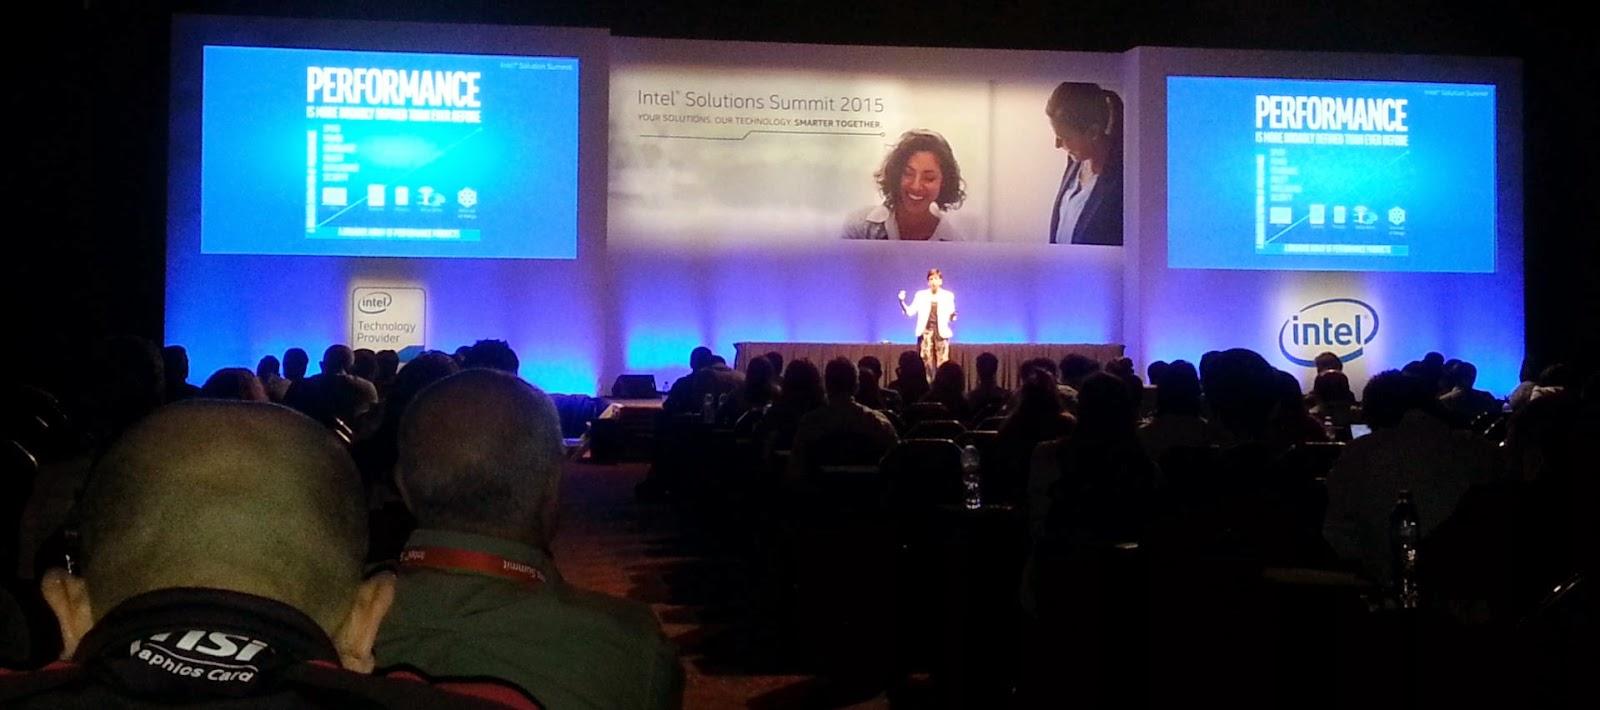 Intel Solutions Summit 2015